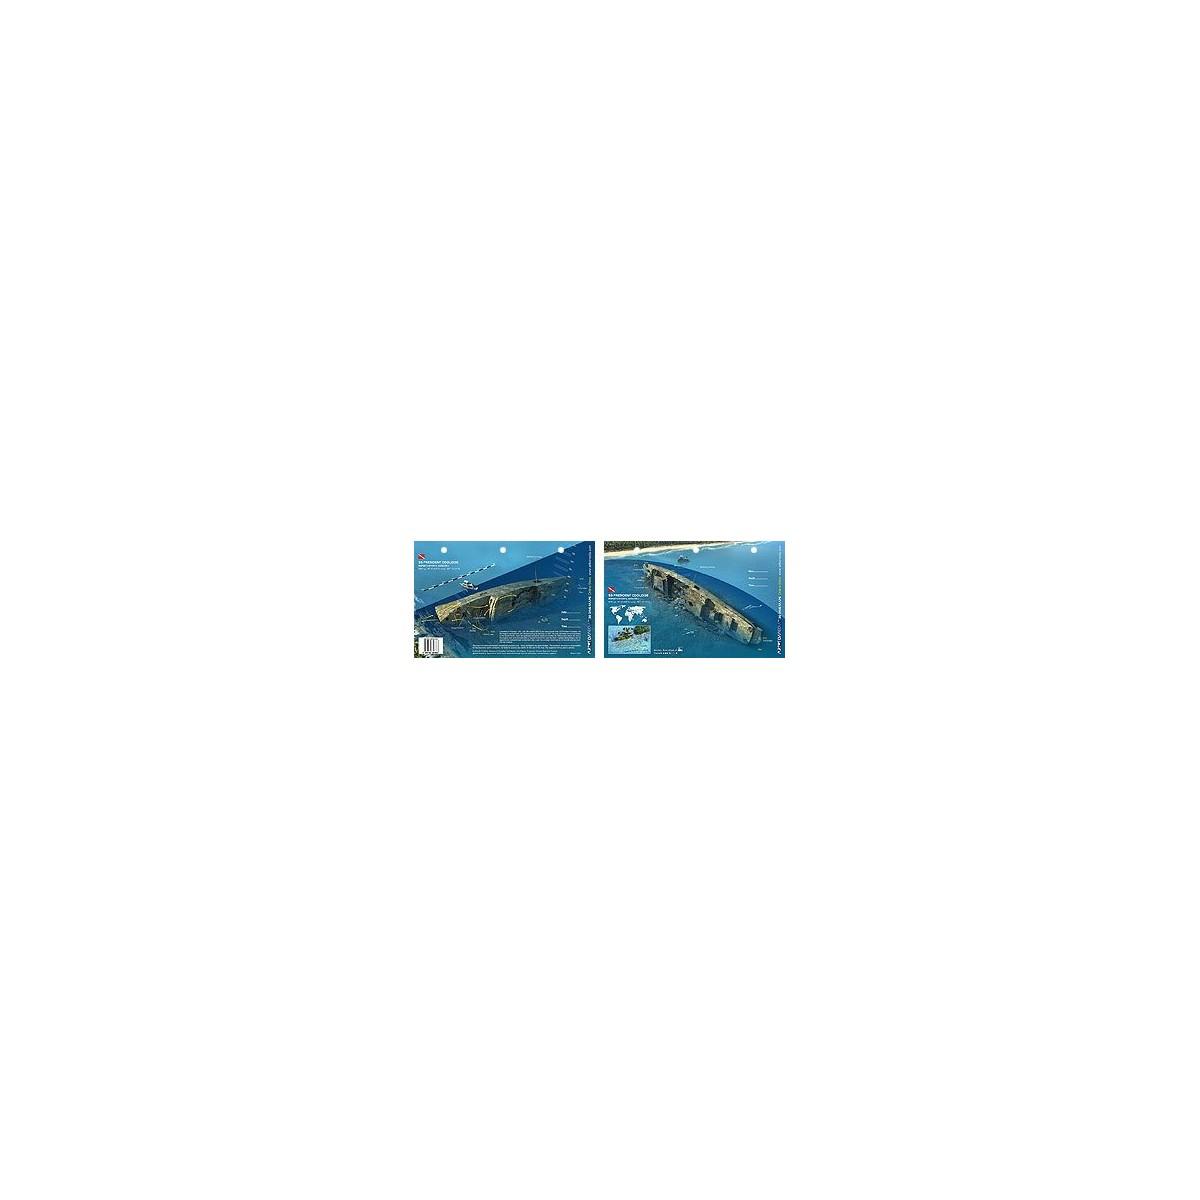 SS President Coolidge in Vanuatu (8.5 x 5.5 Inches) (21.6 x 15cm) - New Art to Media Underwater Waterproof 3D Dive Site Map